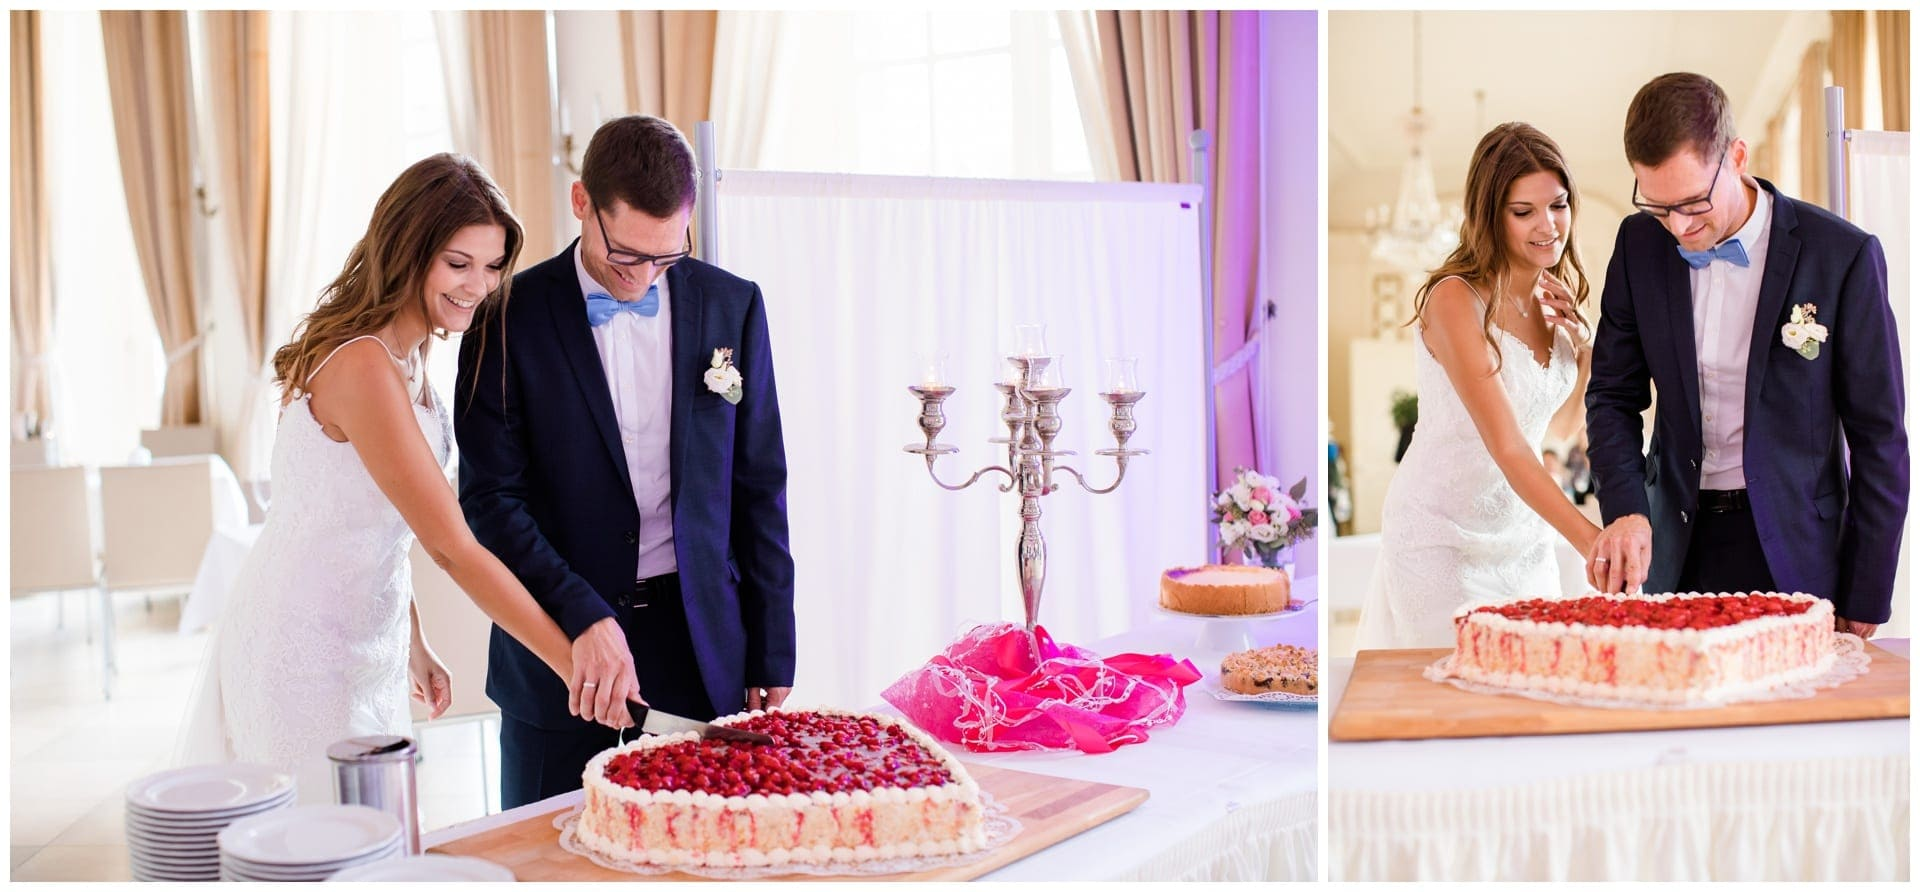 Caroline und Andreas @mama wedding 100